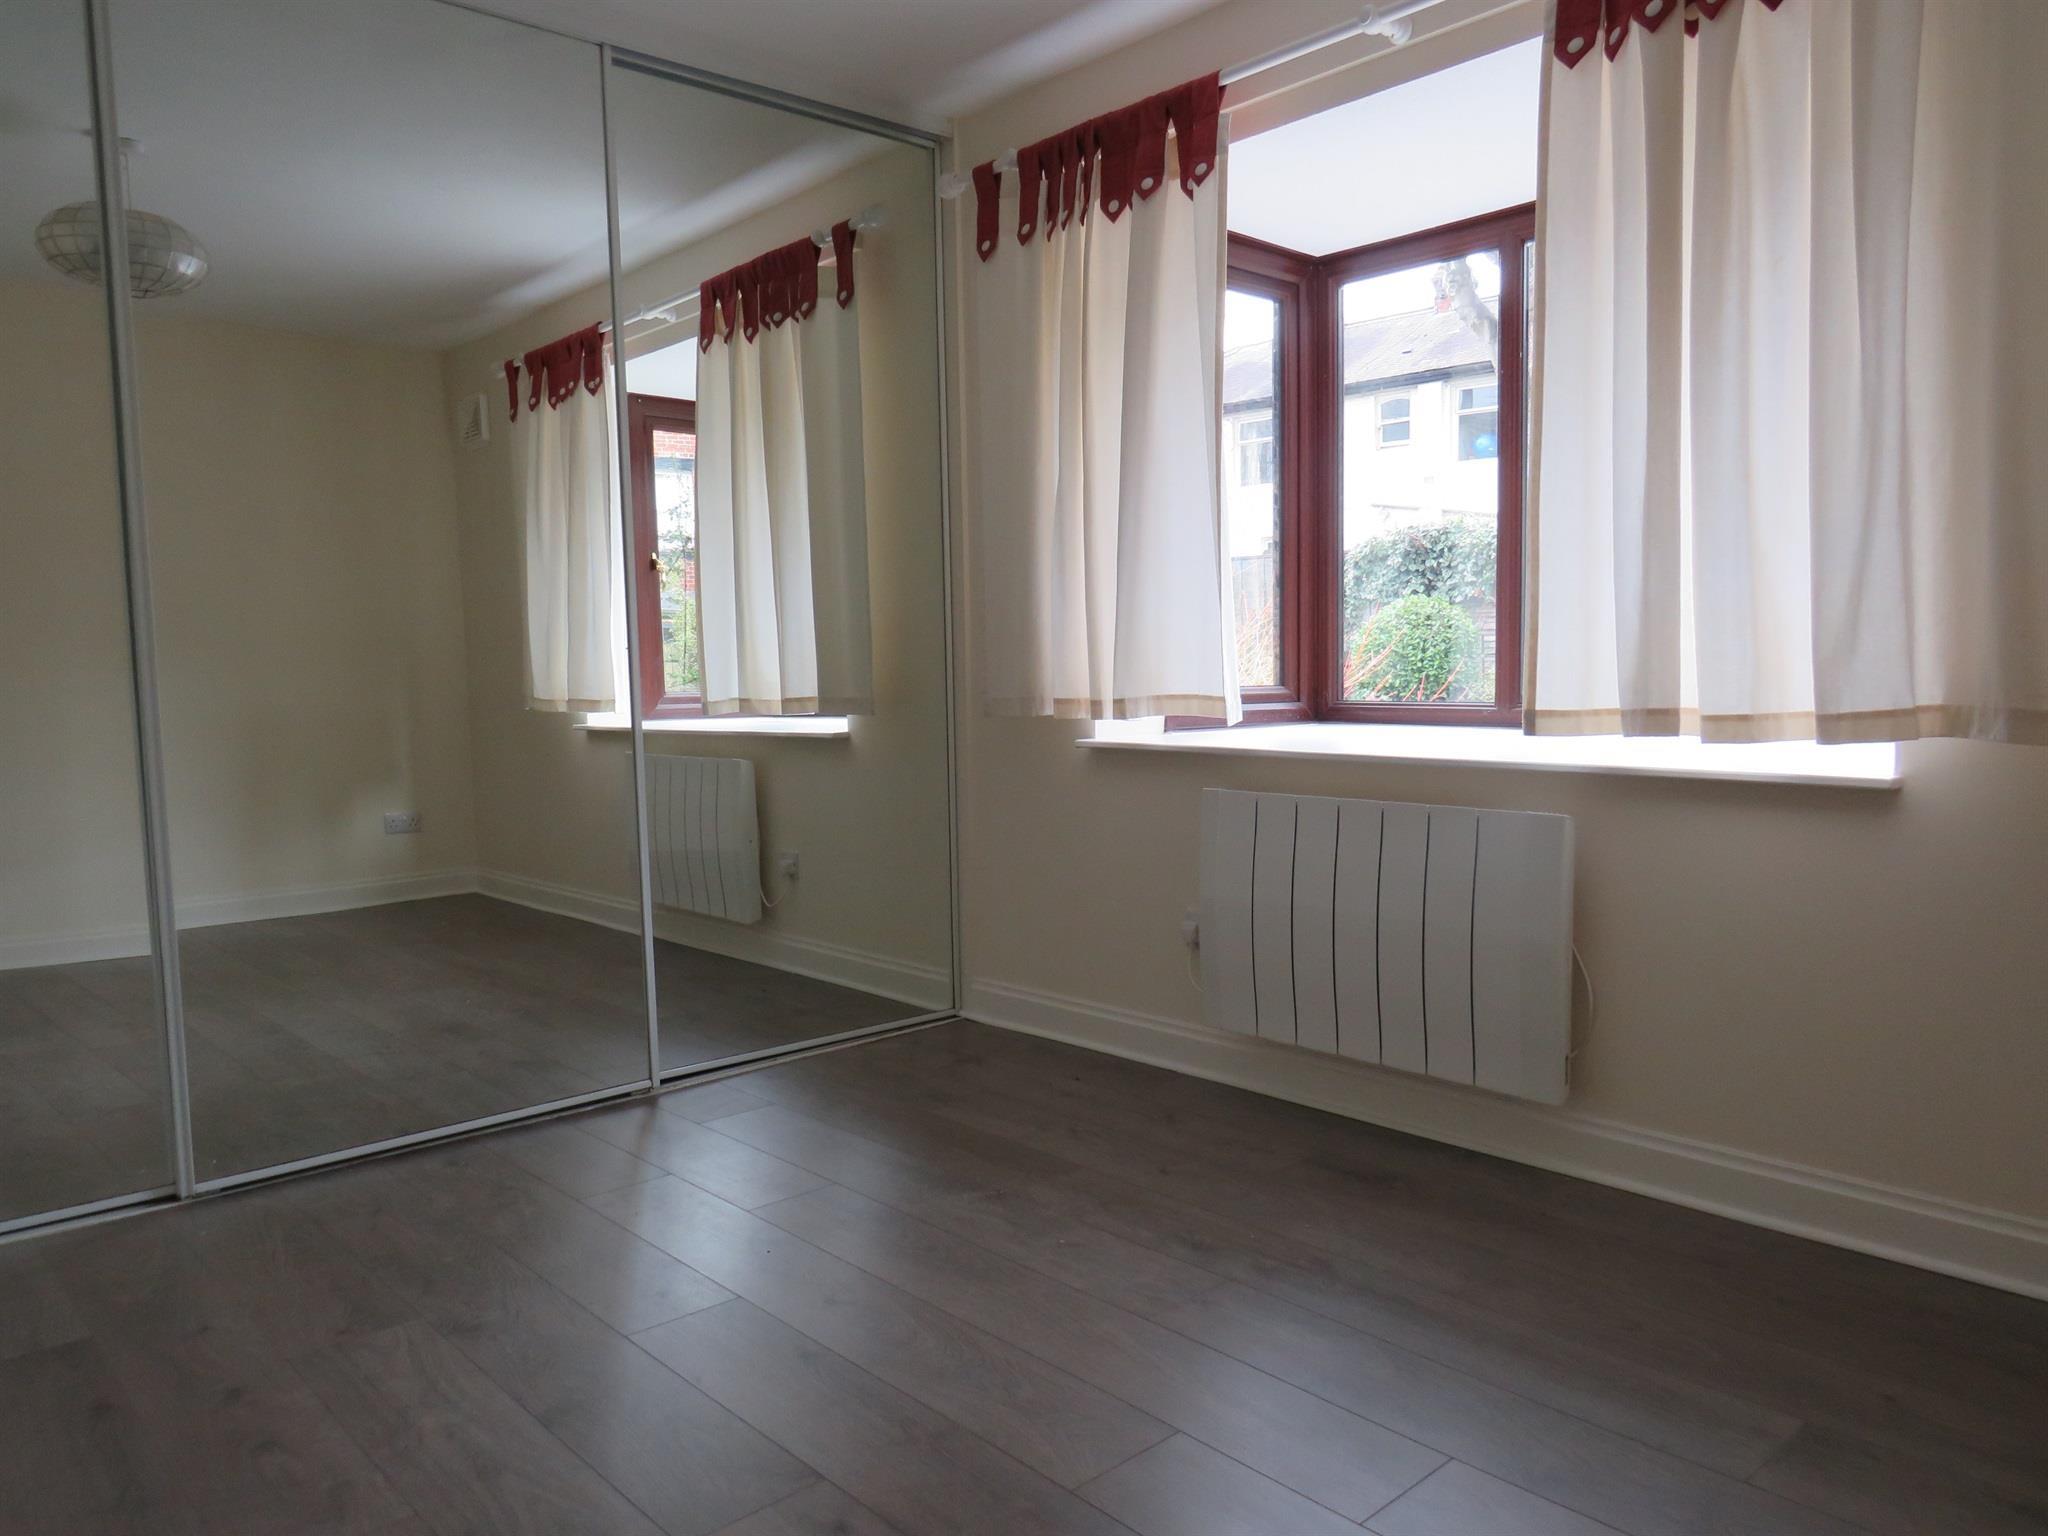 1 Bedroom Apartment For Sale Wellington Court Valley Mount Harrogate Hg2 0nh